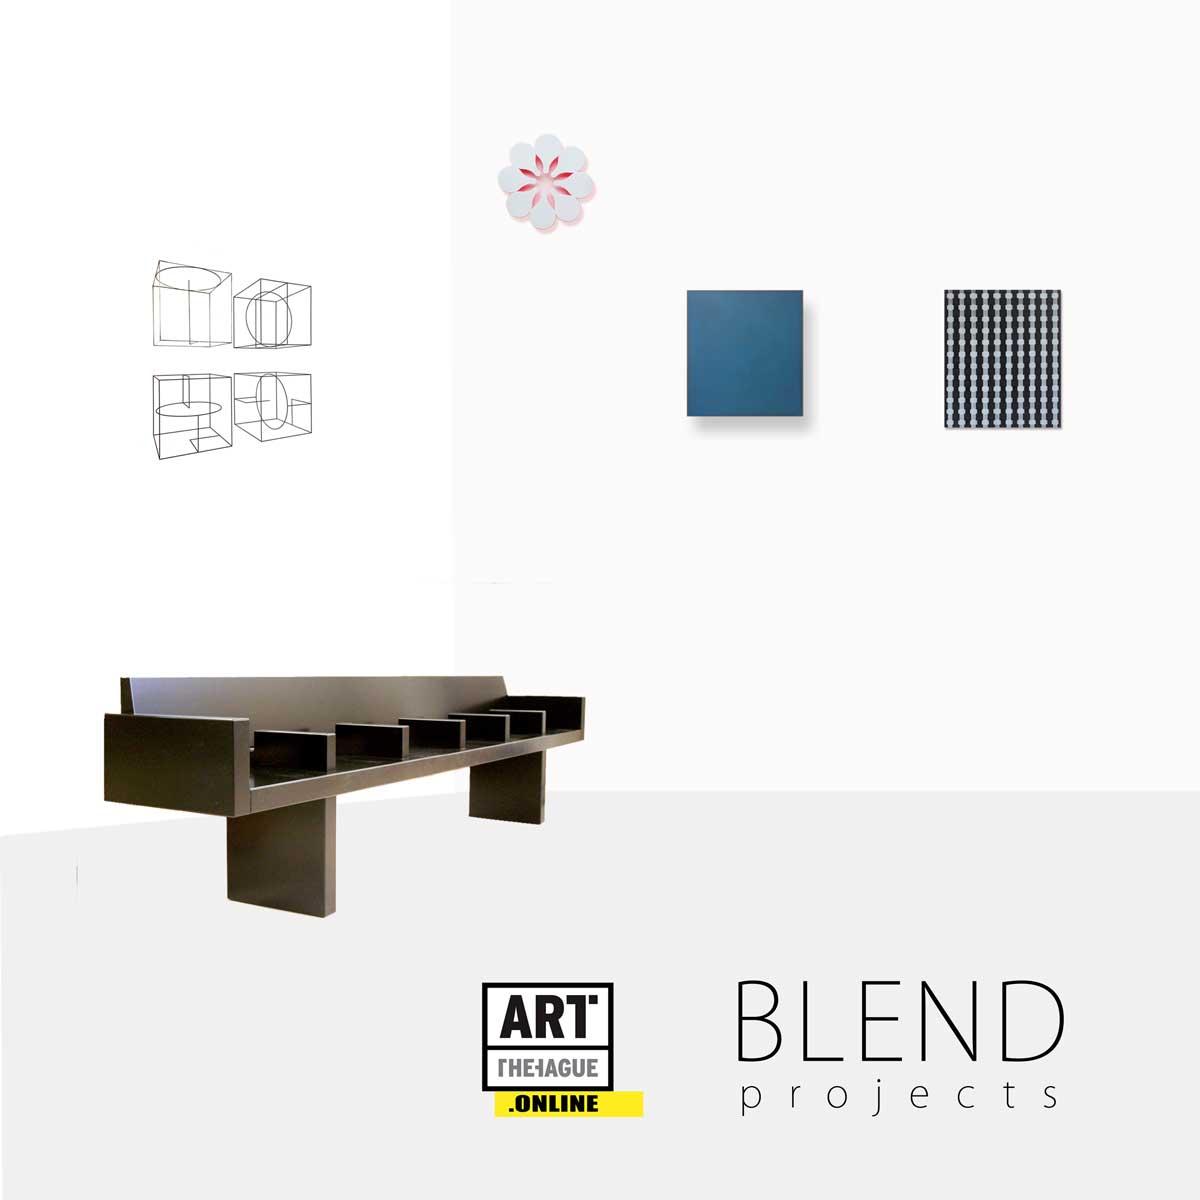 Art The Hauge - Blend Projects